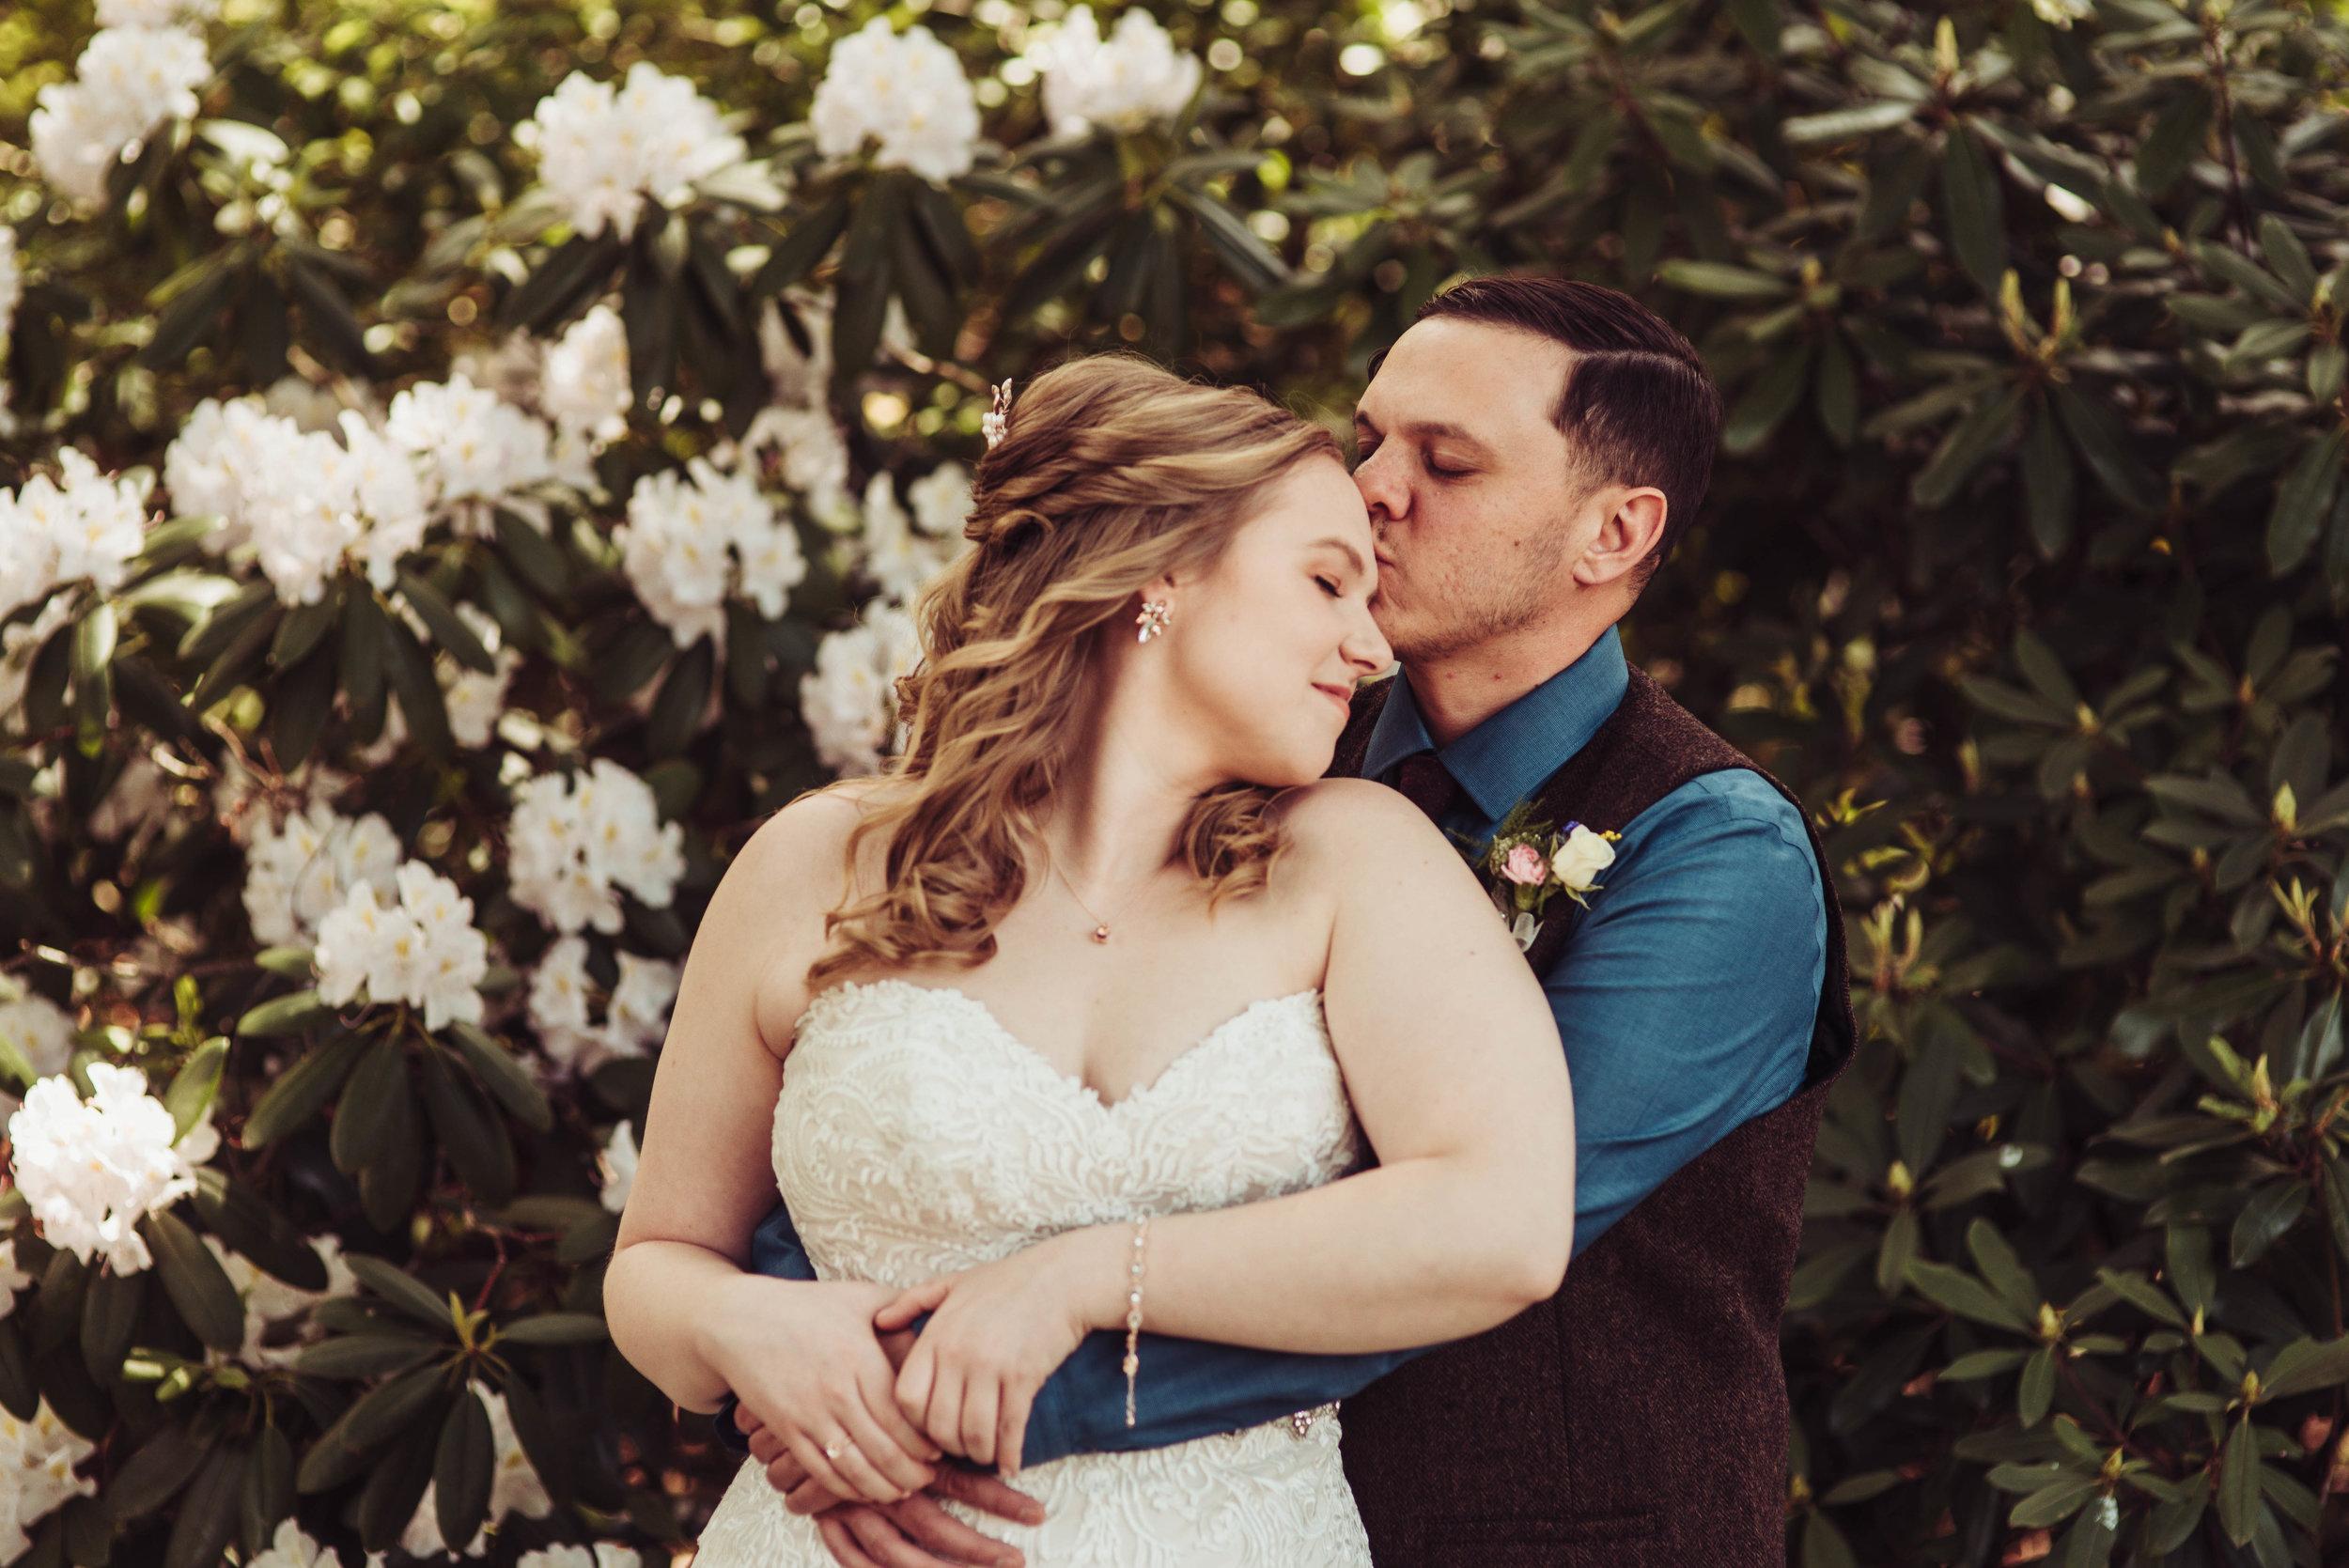 succop wedding photos-24.jpg